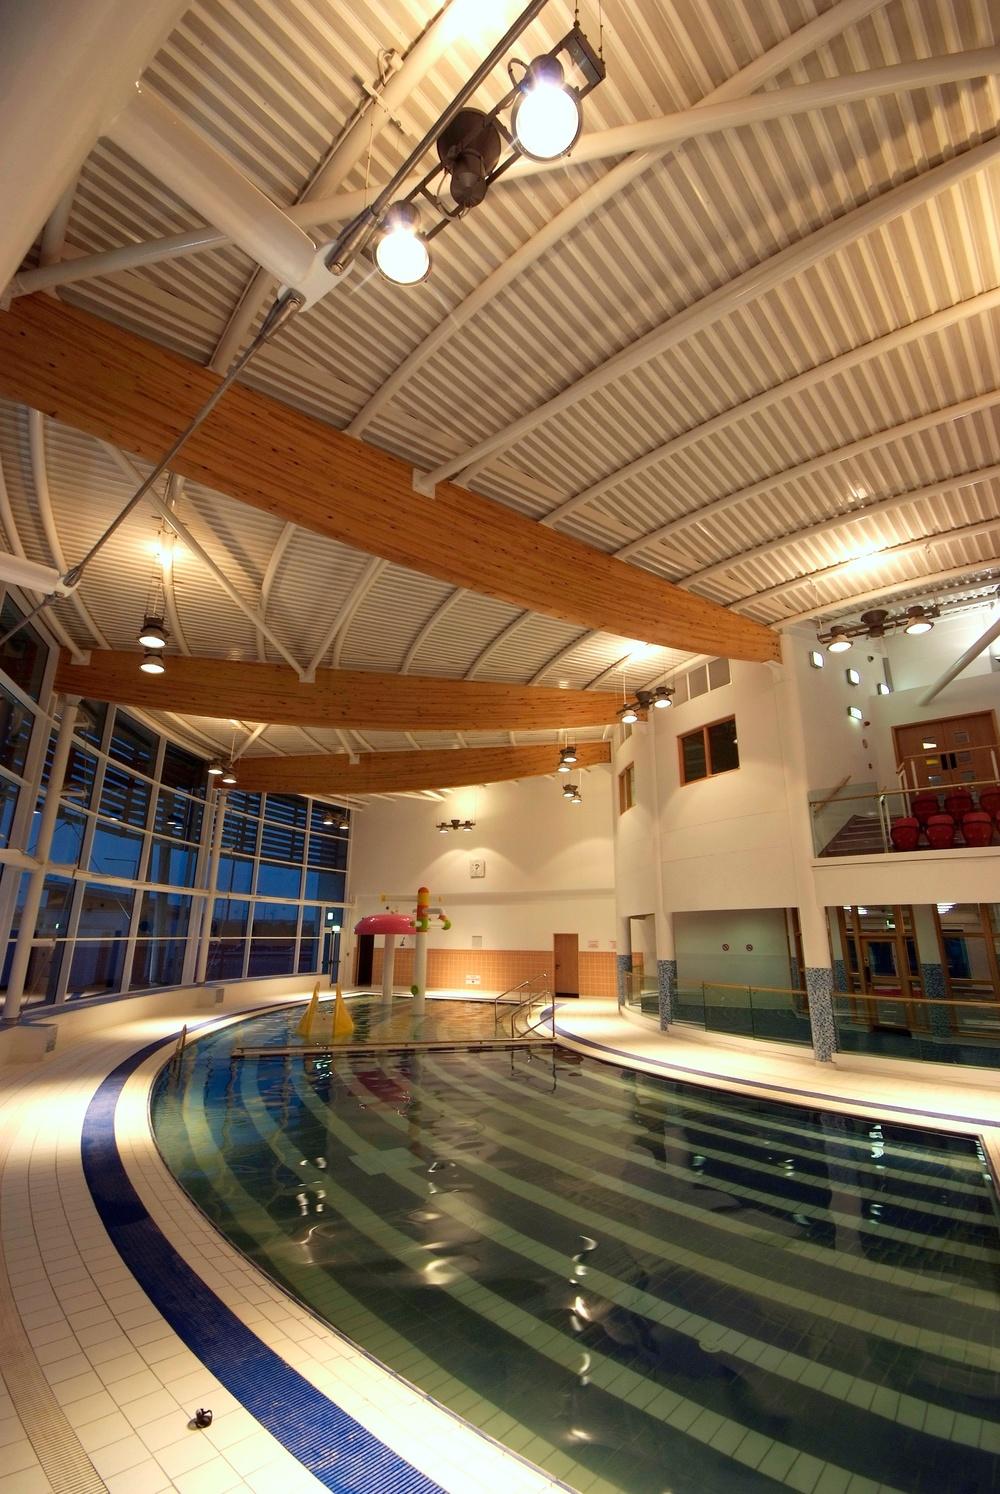 Kilkenny Leisure Centre